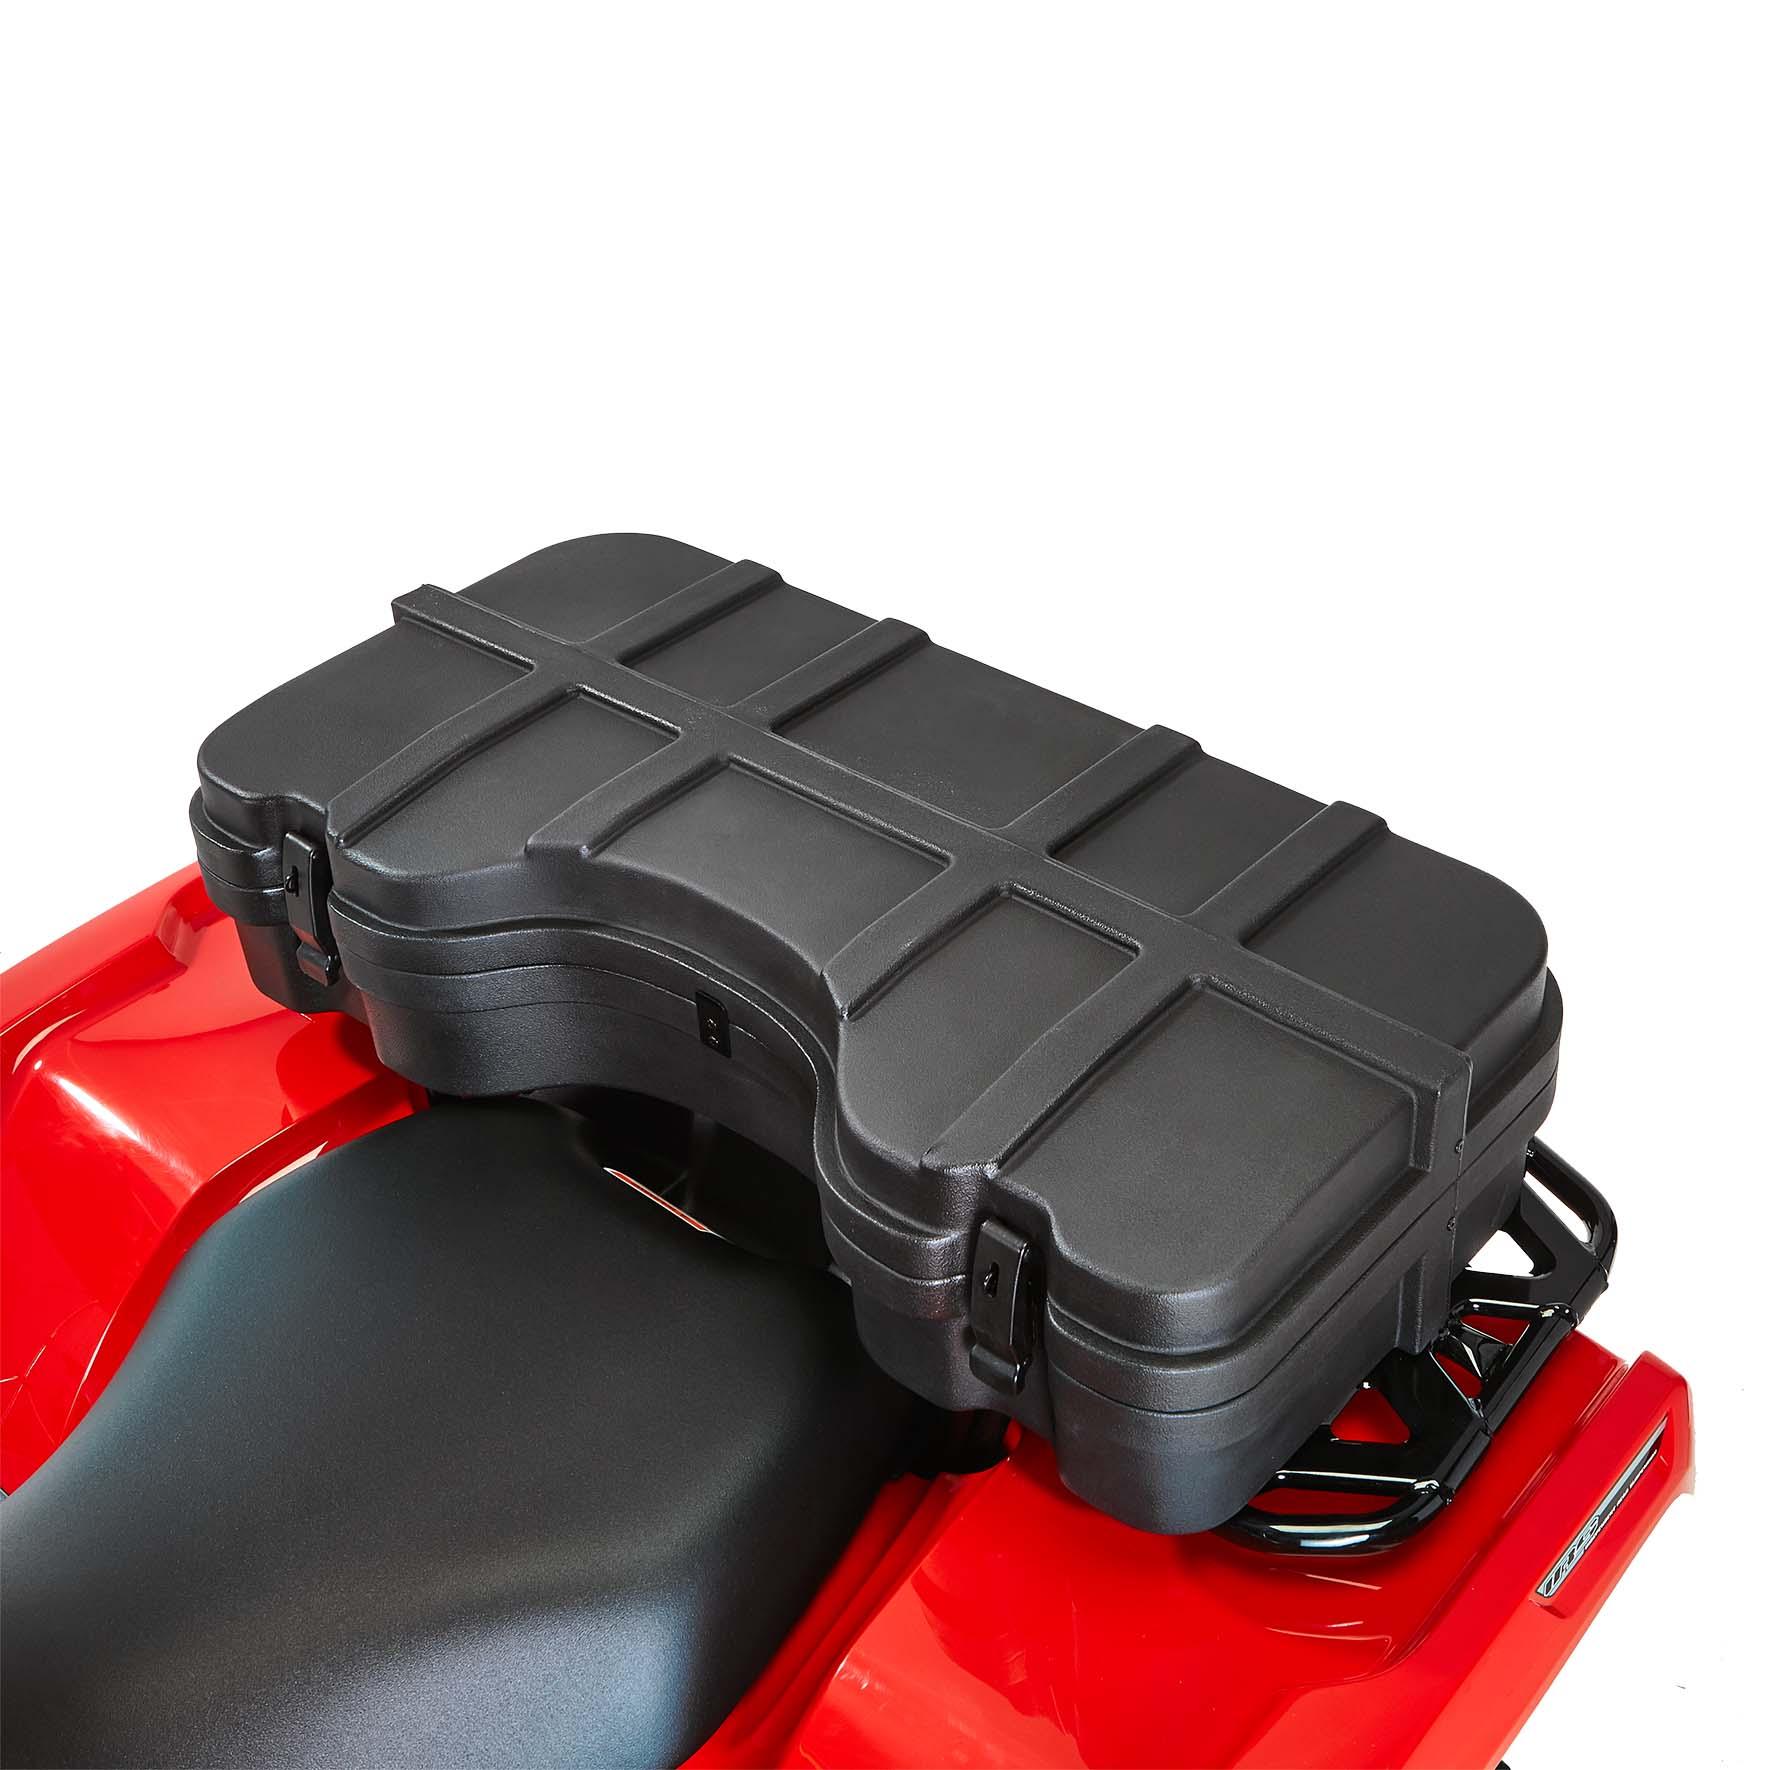 Rotational-molded-ATV-UTV-Cargo-Box